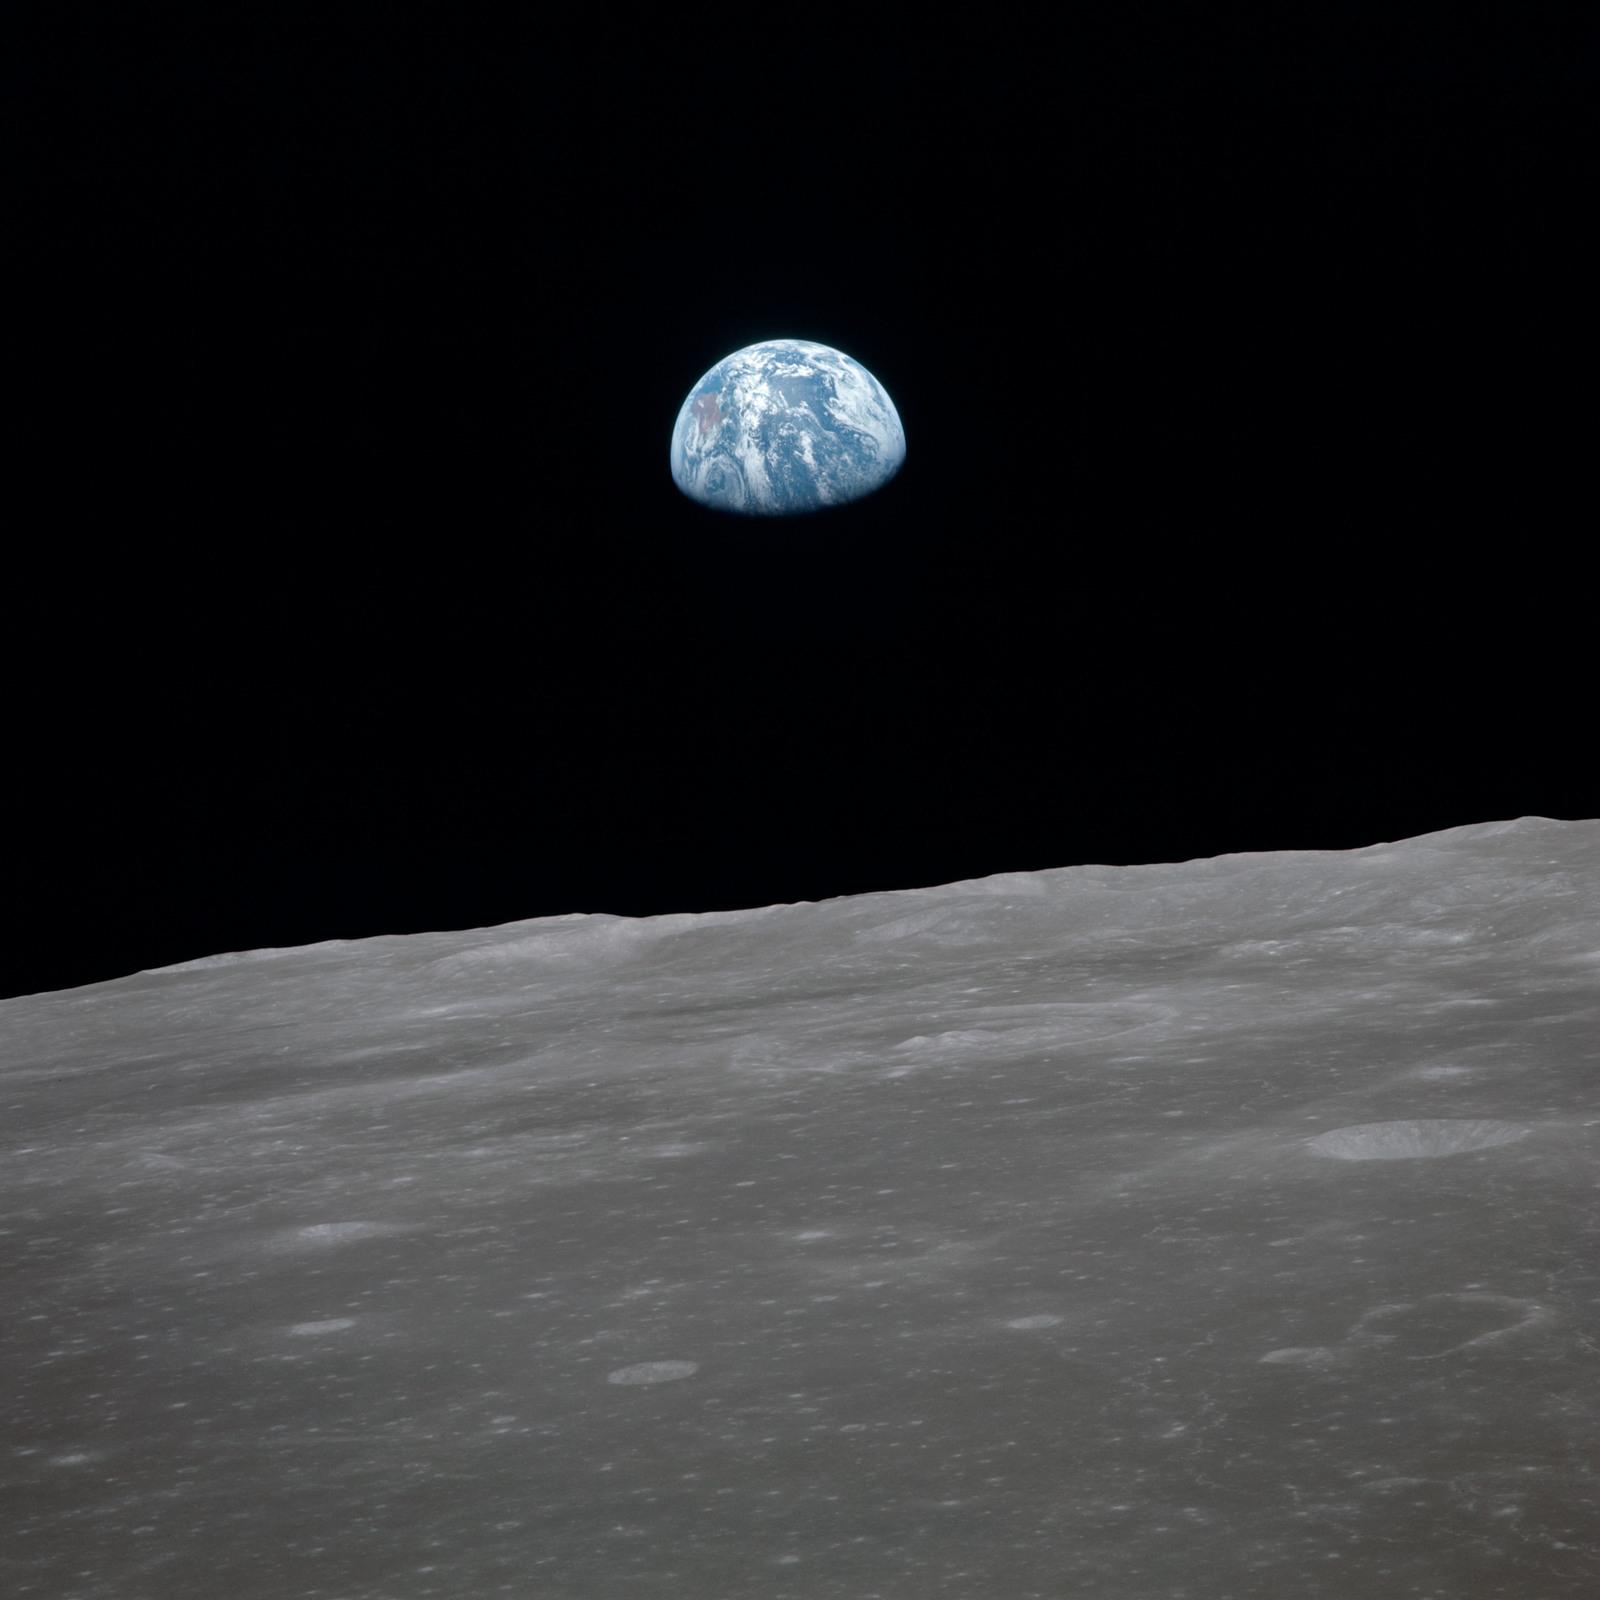 AS11-44-6561 - Apollo 11 - Apollo 11 Mission image - View of moon limb, with Earth on the horizon, Mare Smythii Region